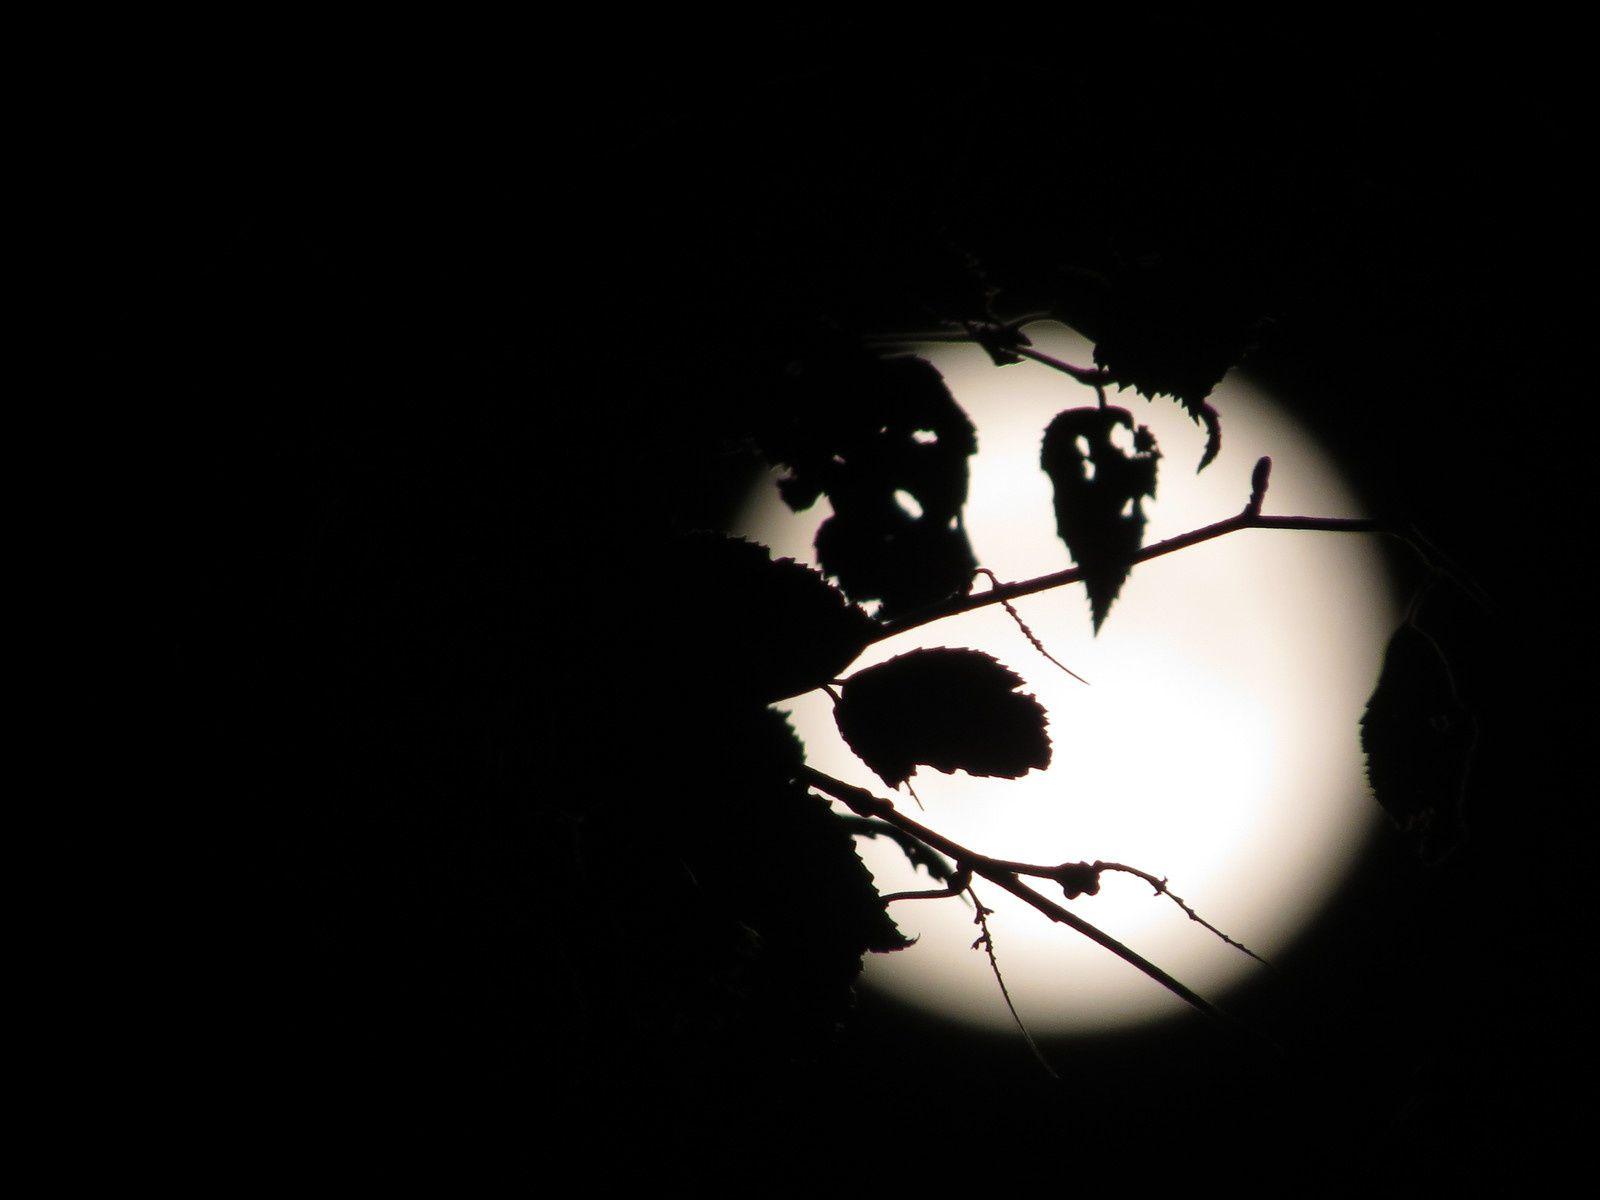 La lune...